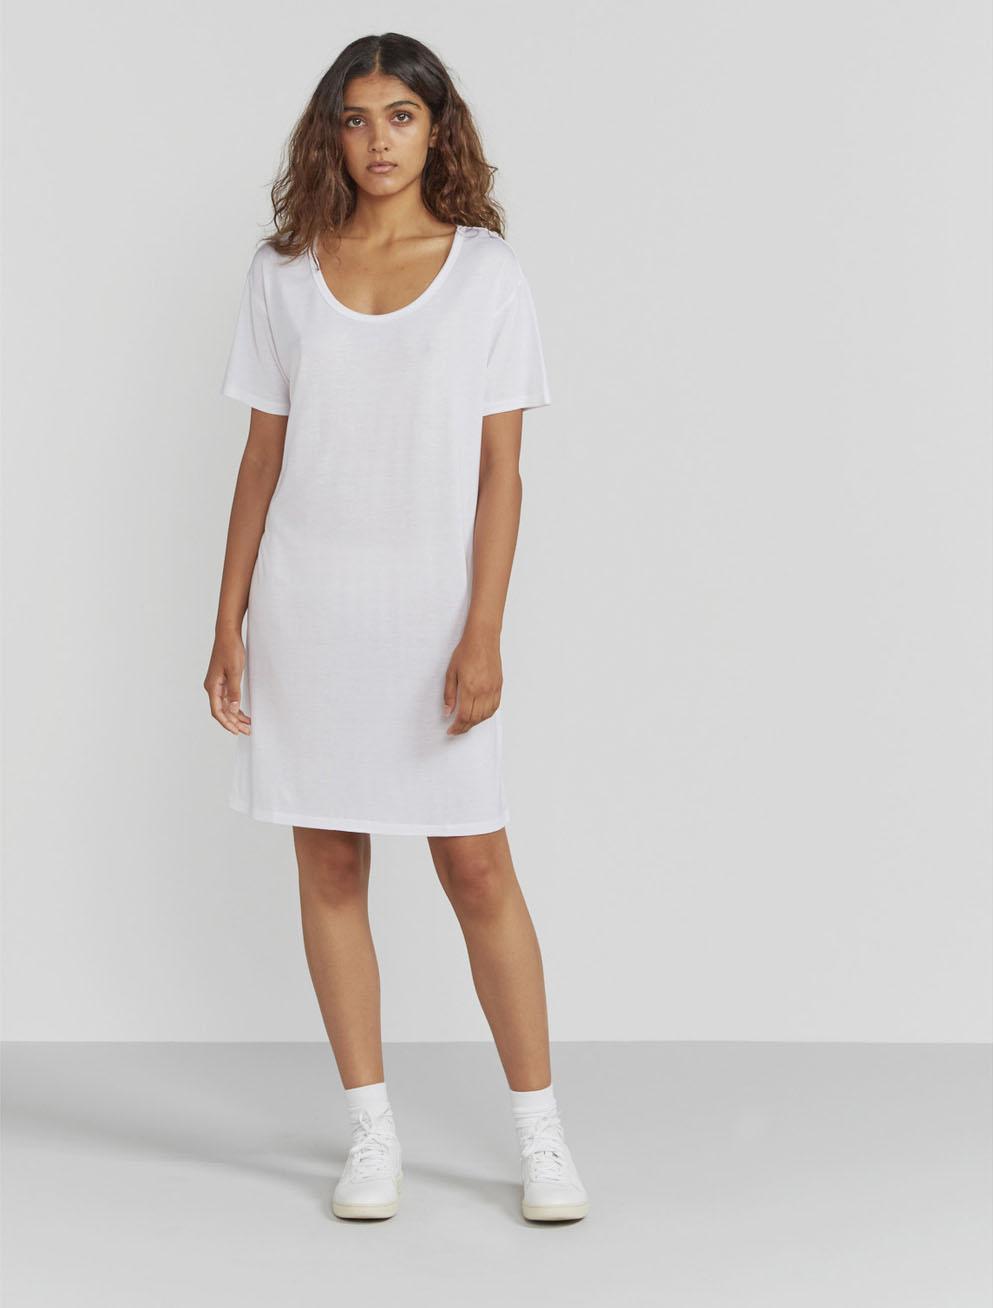 Scoop-neck T-shirt dress